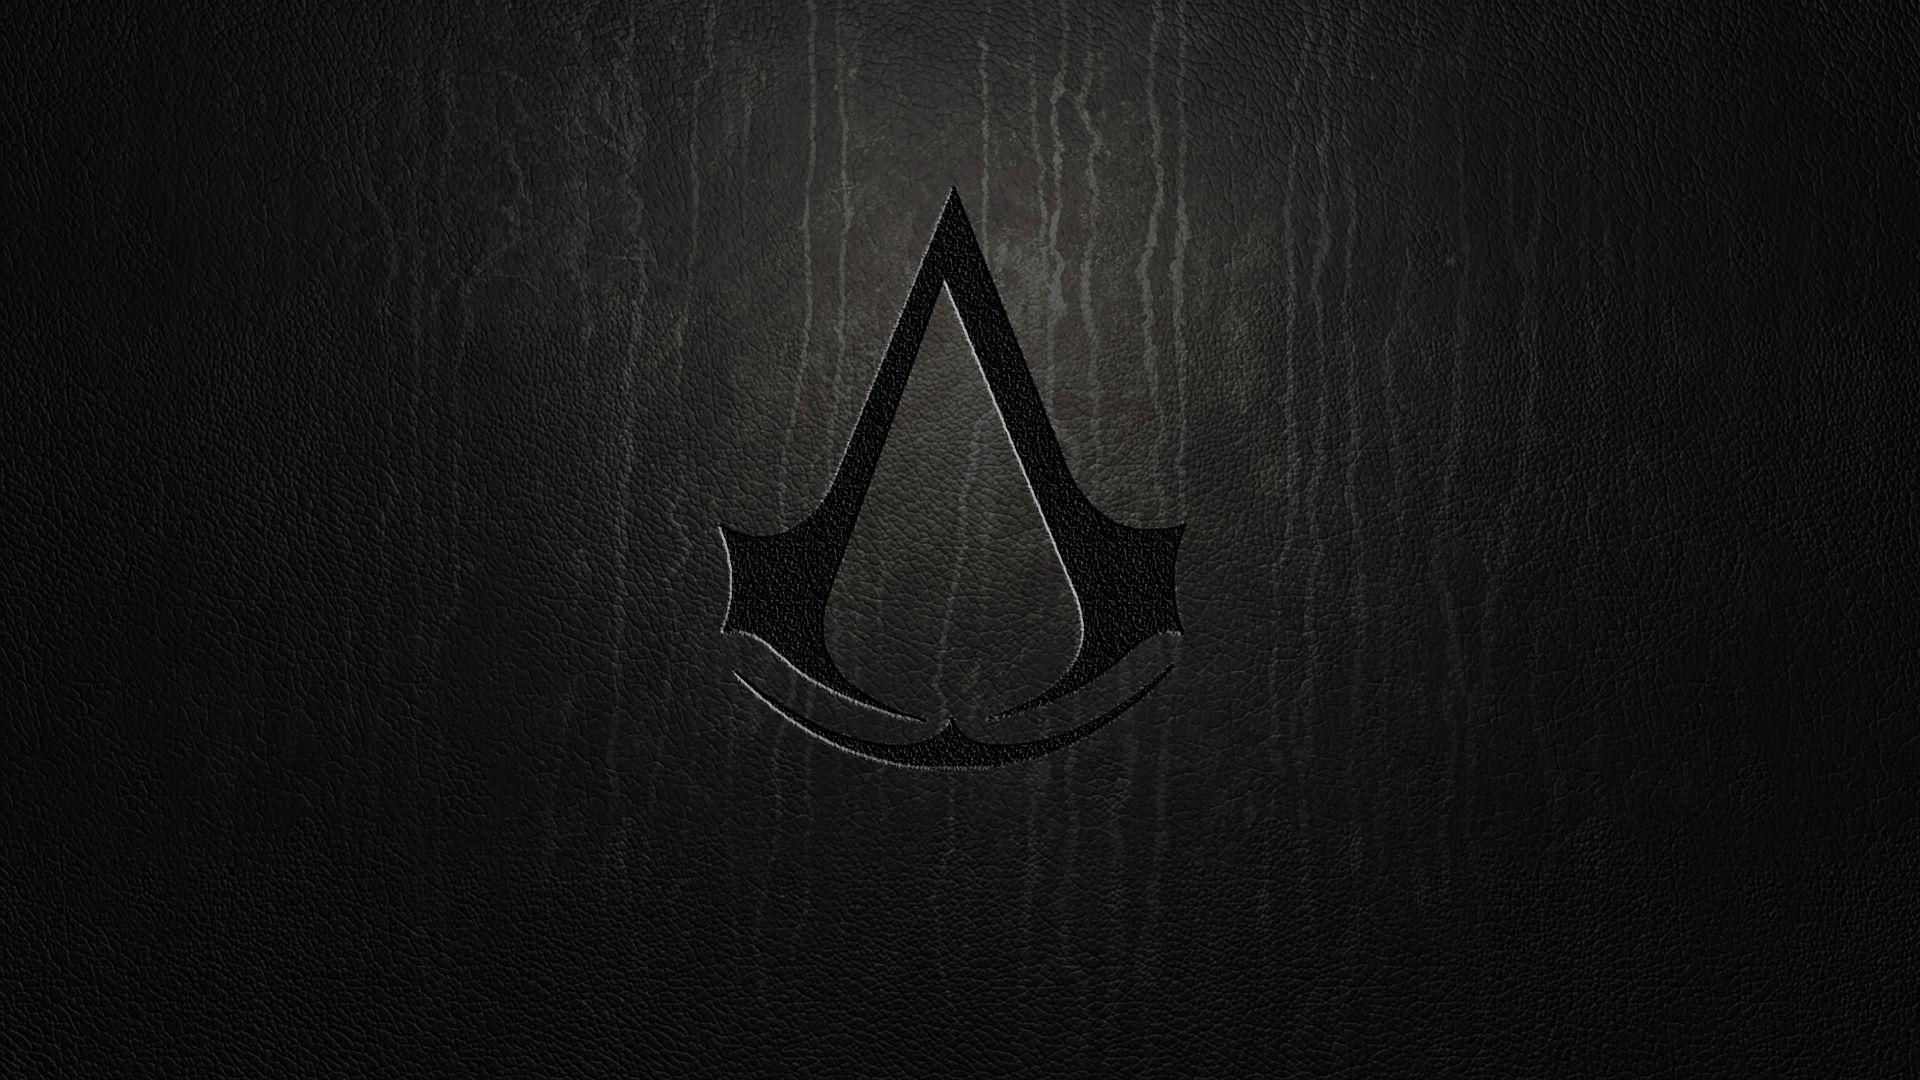 assassinand 39 s creed unity logo. apple watch face - assassin. assasincreed   custom faces pinterest hd wallpaper and assassinand 39 s creed unity logo